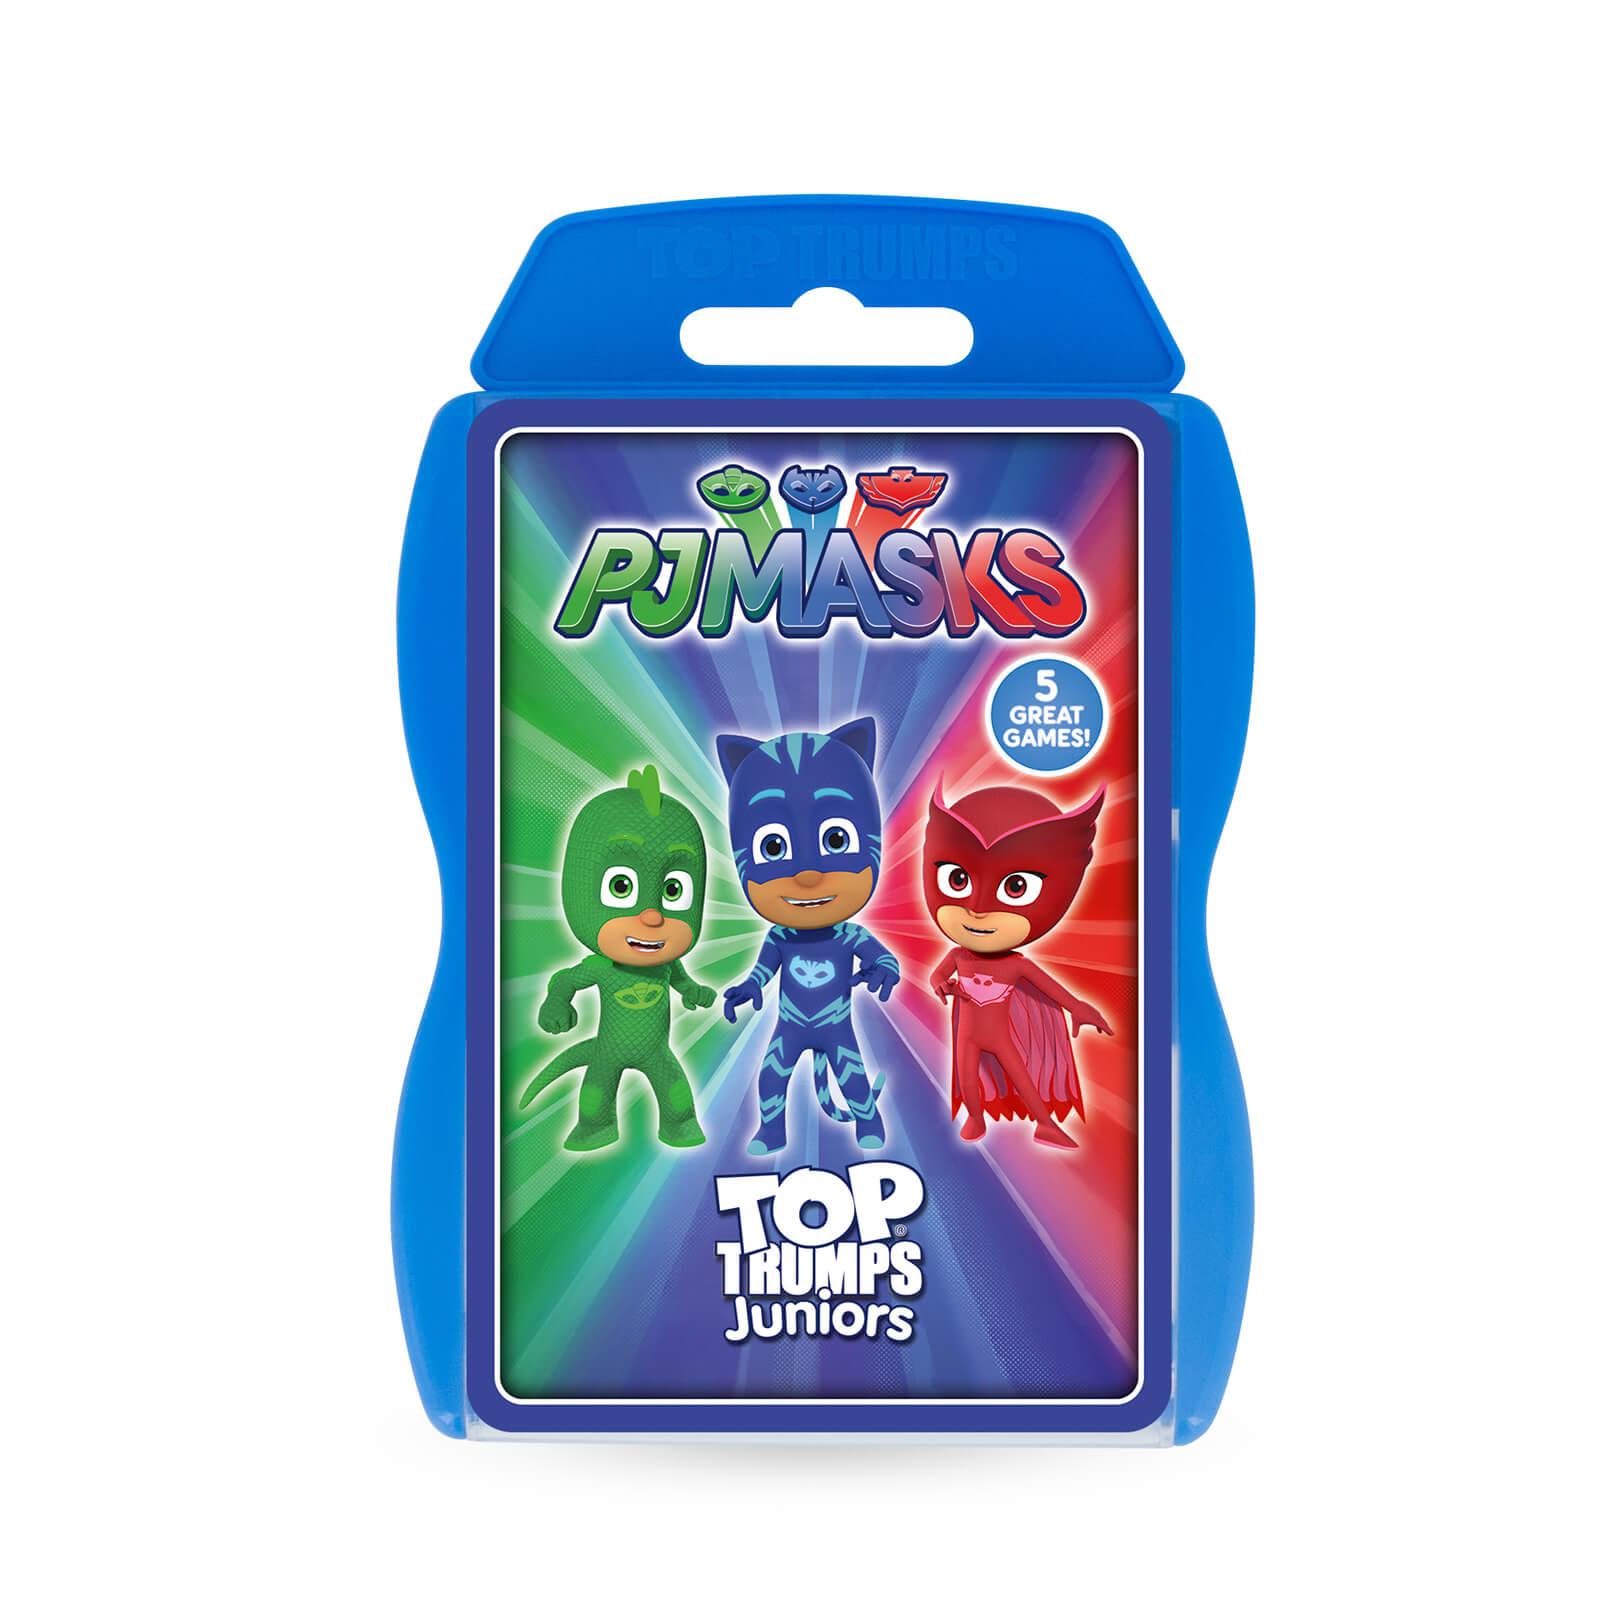 Image of Top Trumps Junior Card Game - PJ Masks Edition